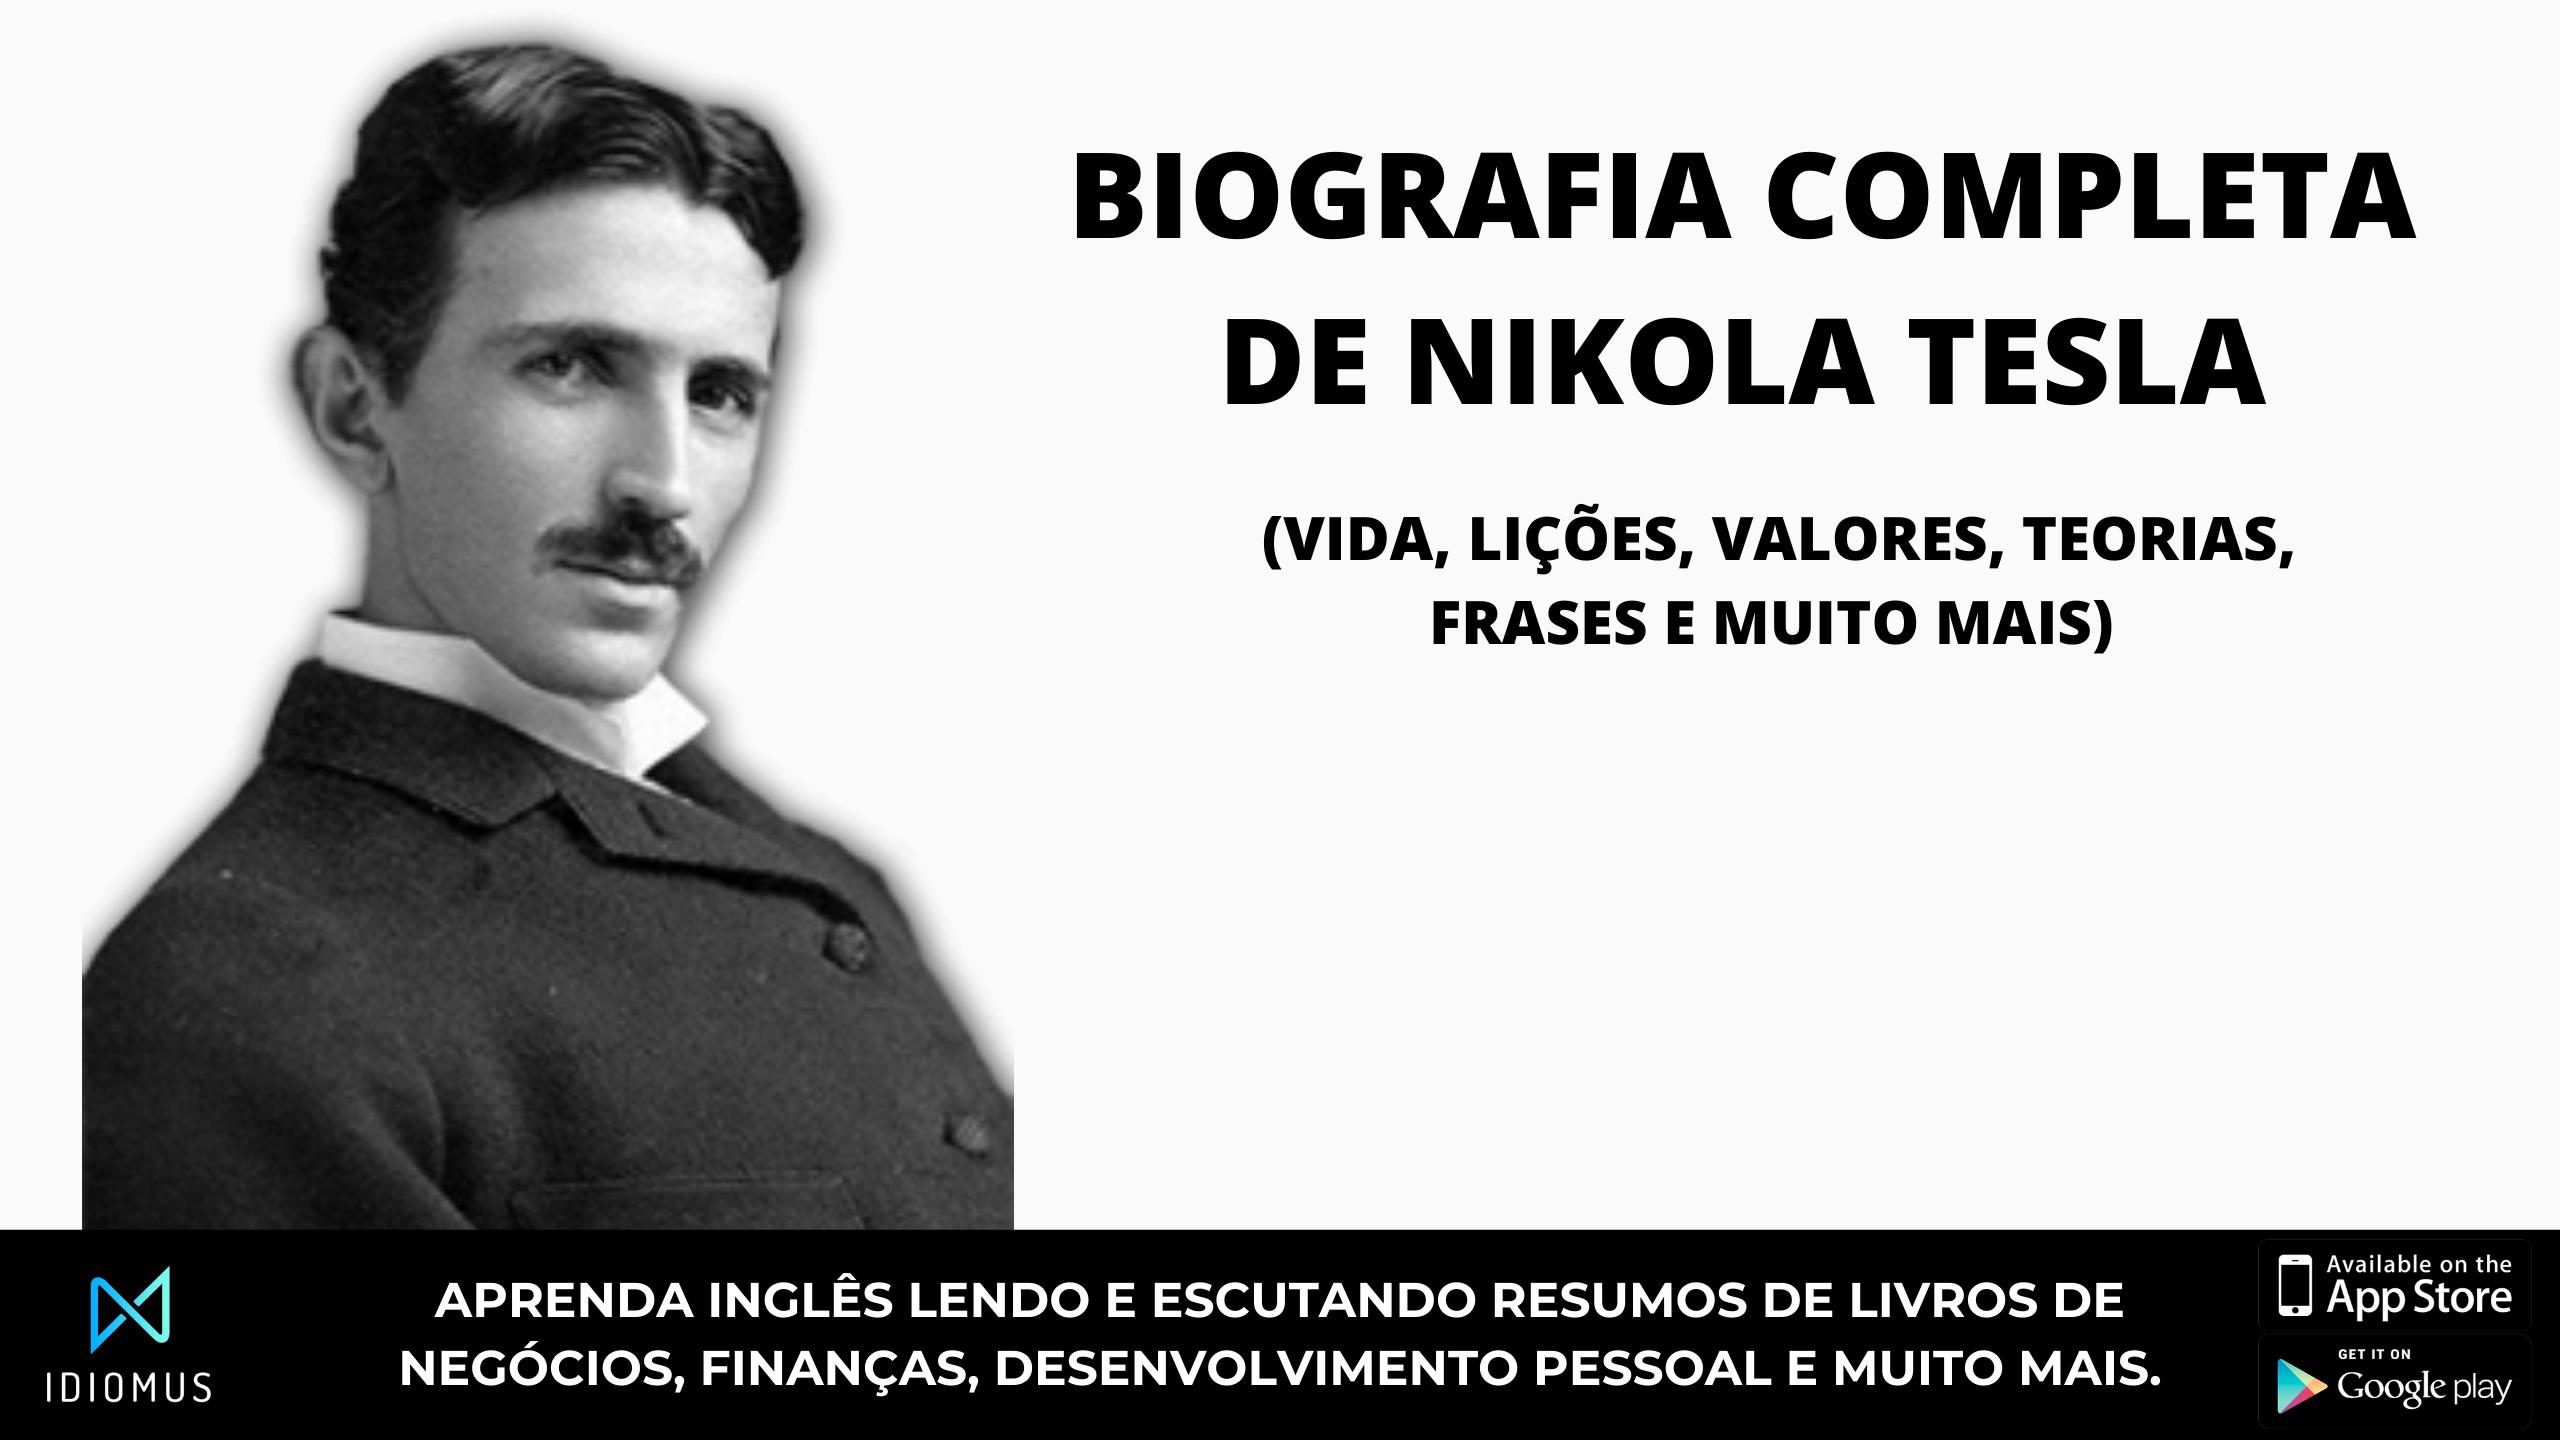 Biografia Nikola tesla (frases, ensinamentos, invenções)